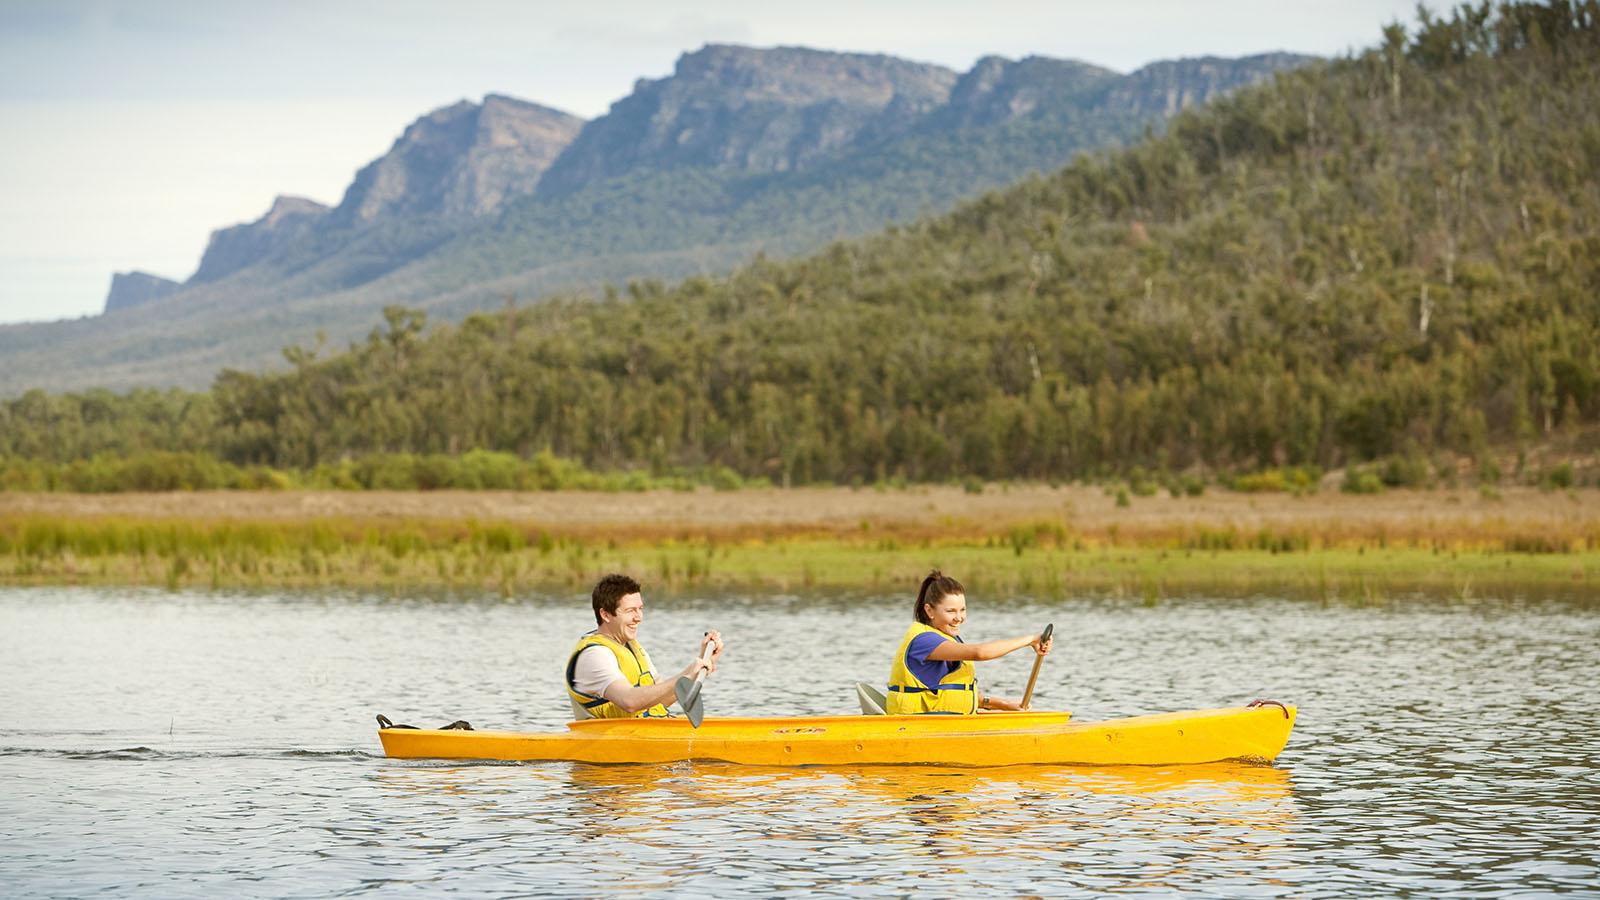 Canoeing at Lake Bellfield, The Grampians, Victoria, Australia